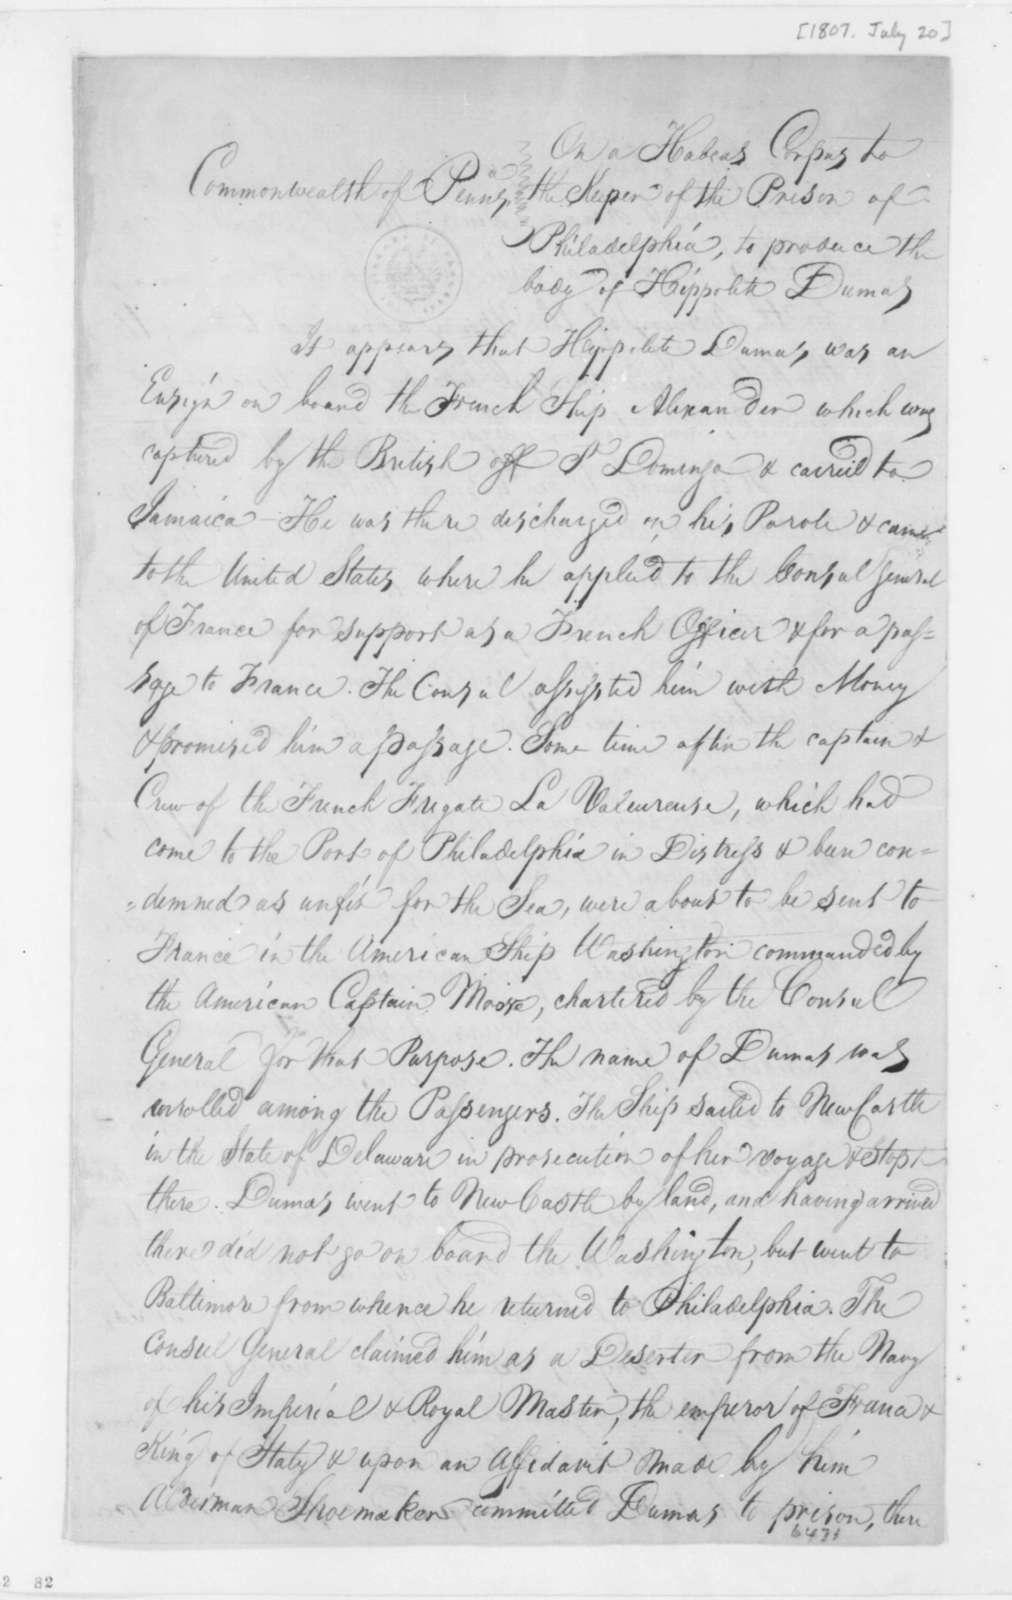 Tilghman & Smith, July 20, 1807. Habeas Corpus Writ, Dumas Case.